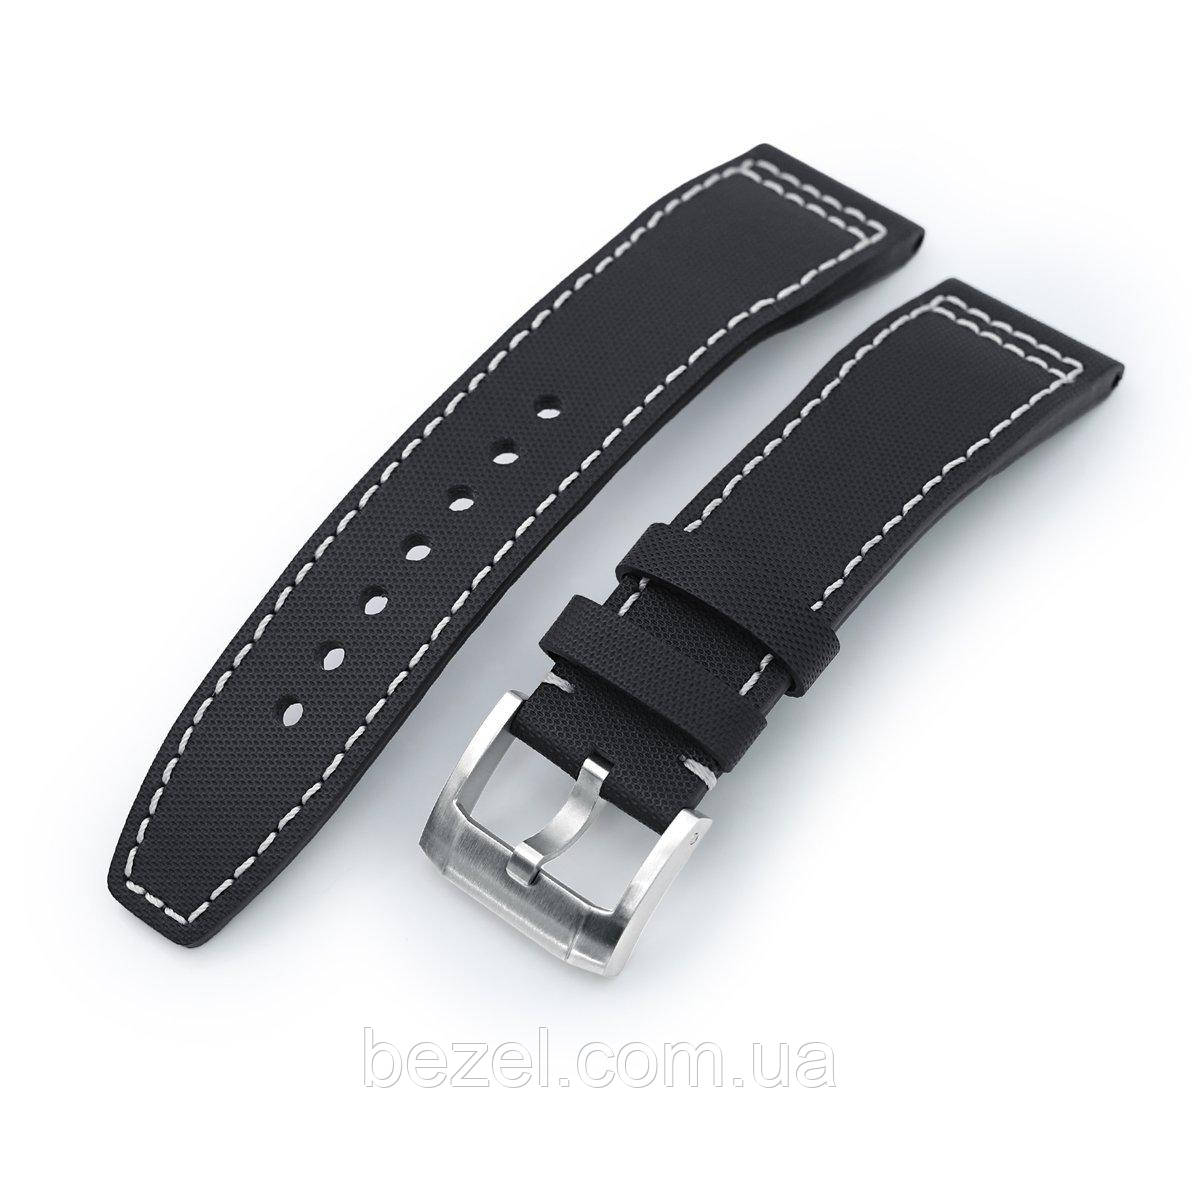 20mm to 23mm Pilot Black Kevlar Finish Watch Strap, Beige Stitching, Brushed